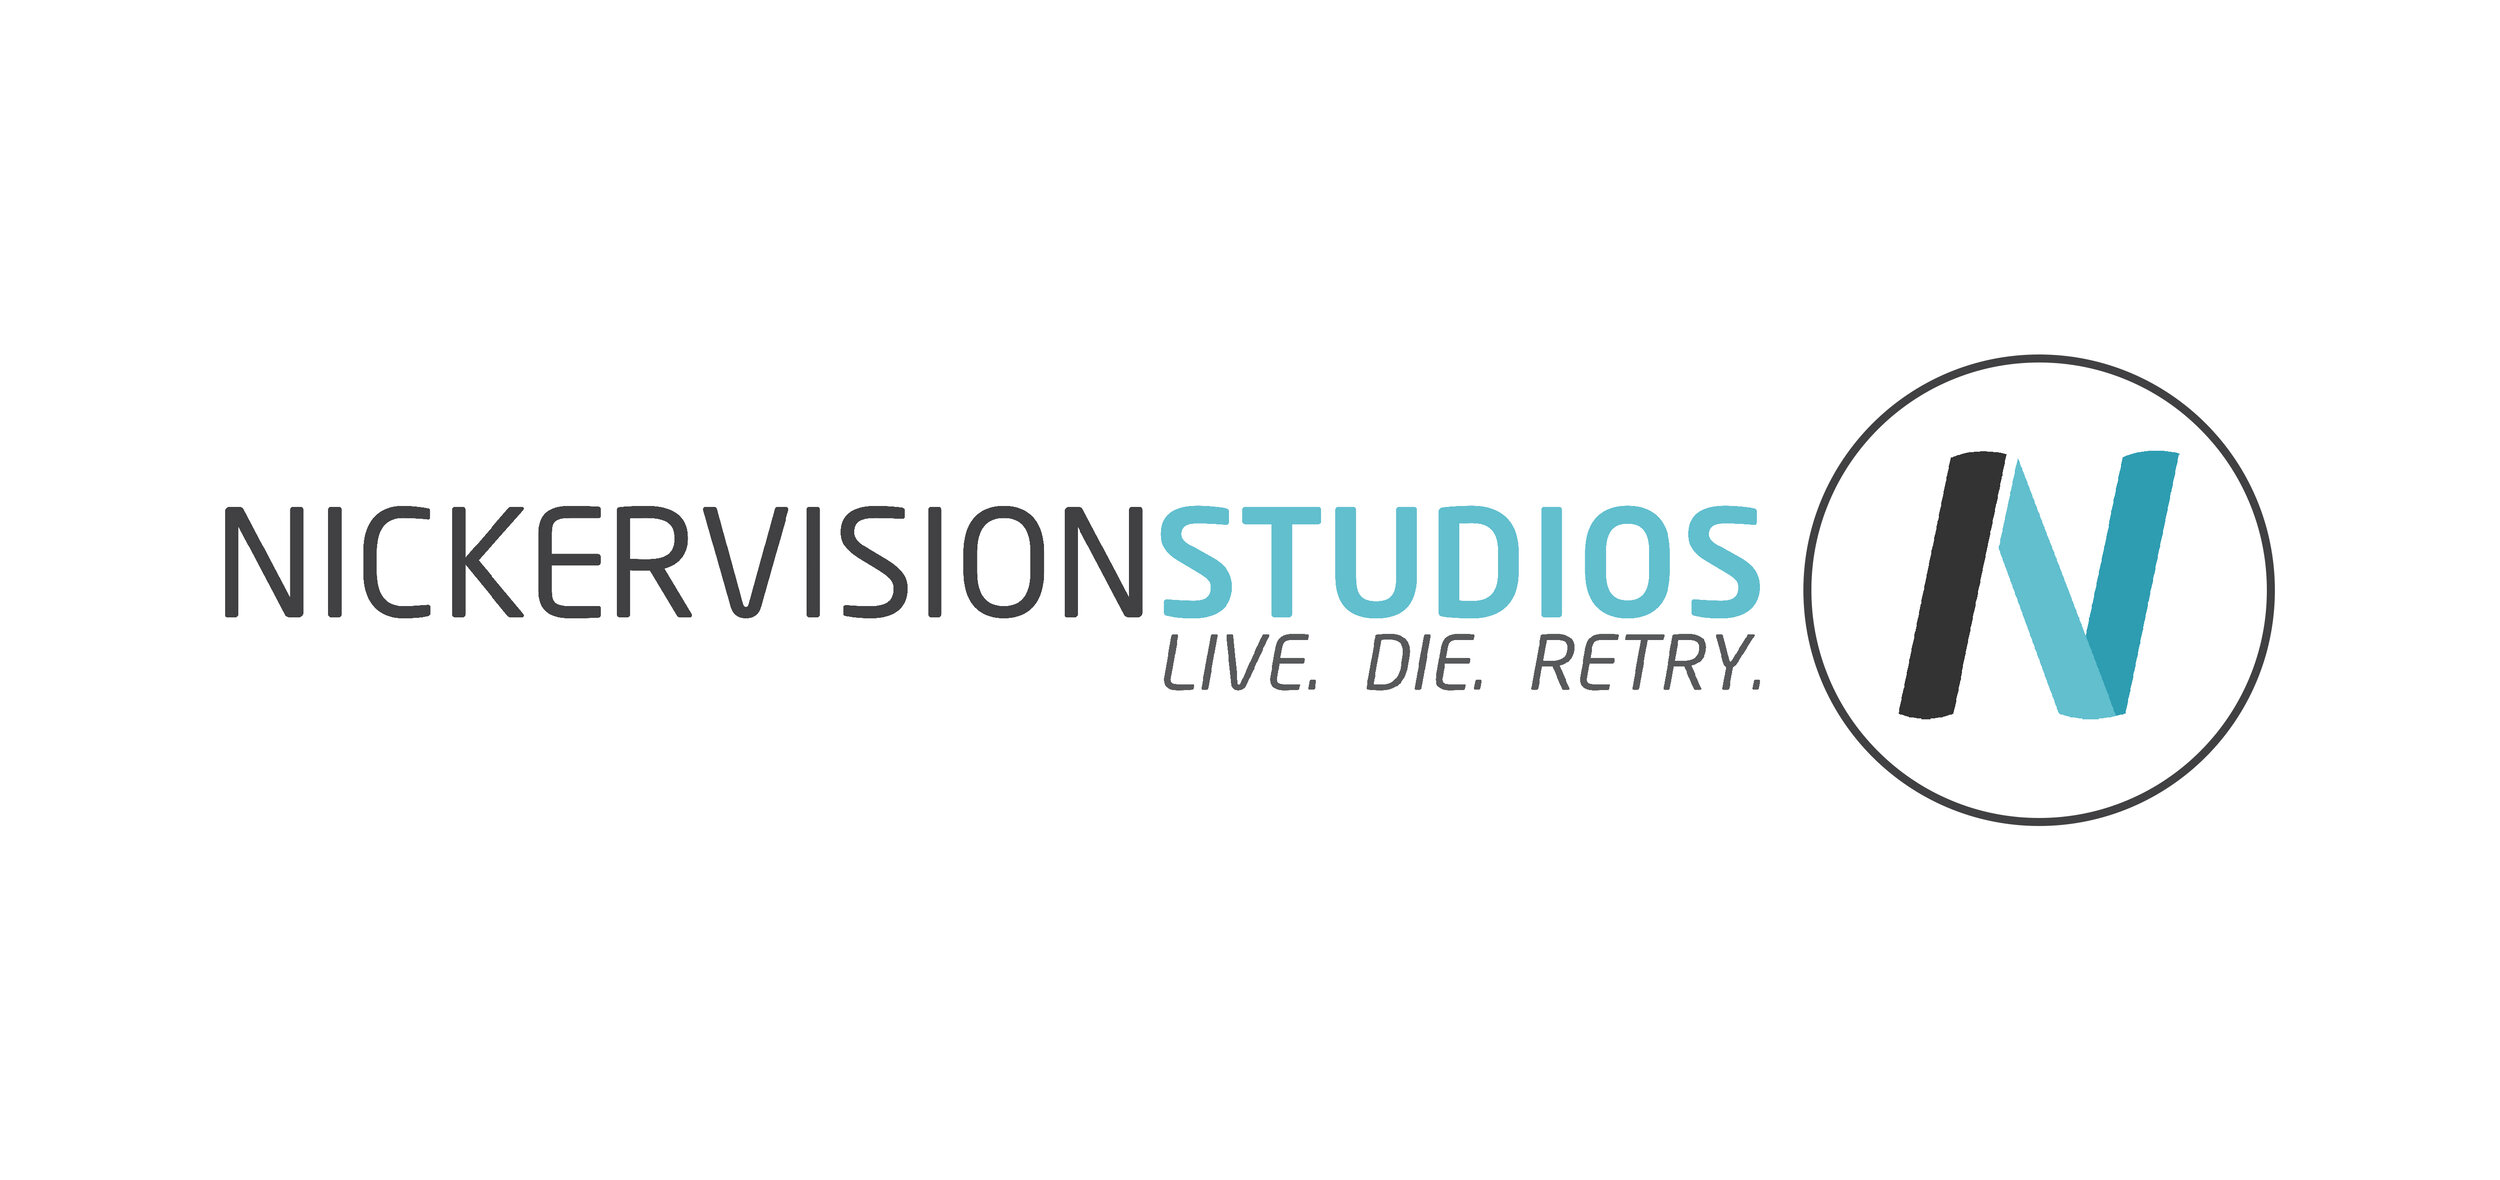 https://store.steampowered.com/dev/nickervisionstudios/